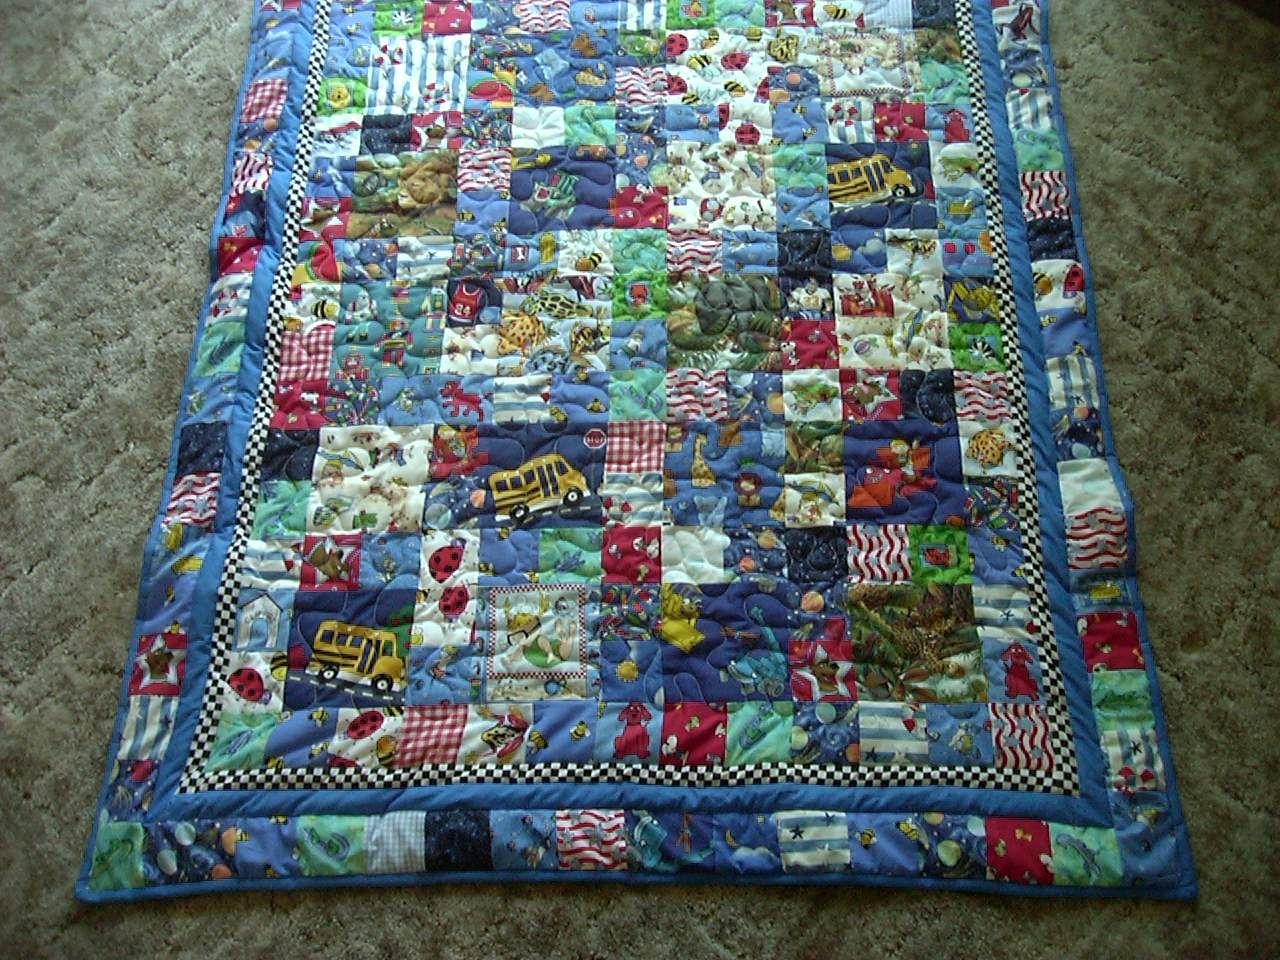 Sheryl's Quilting | quilt | Pinterest | Baby bedding : quilt photo - Adamdwight.com